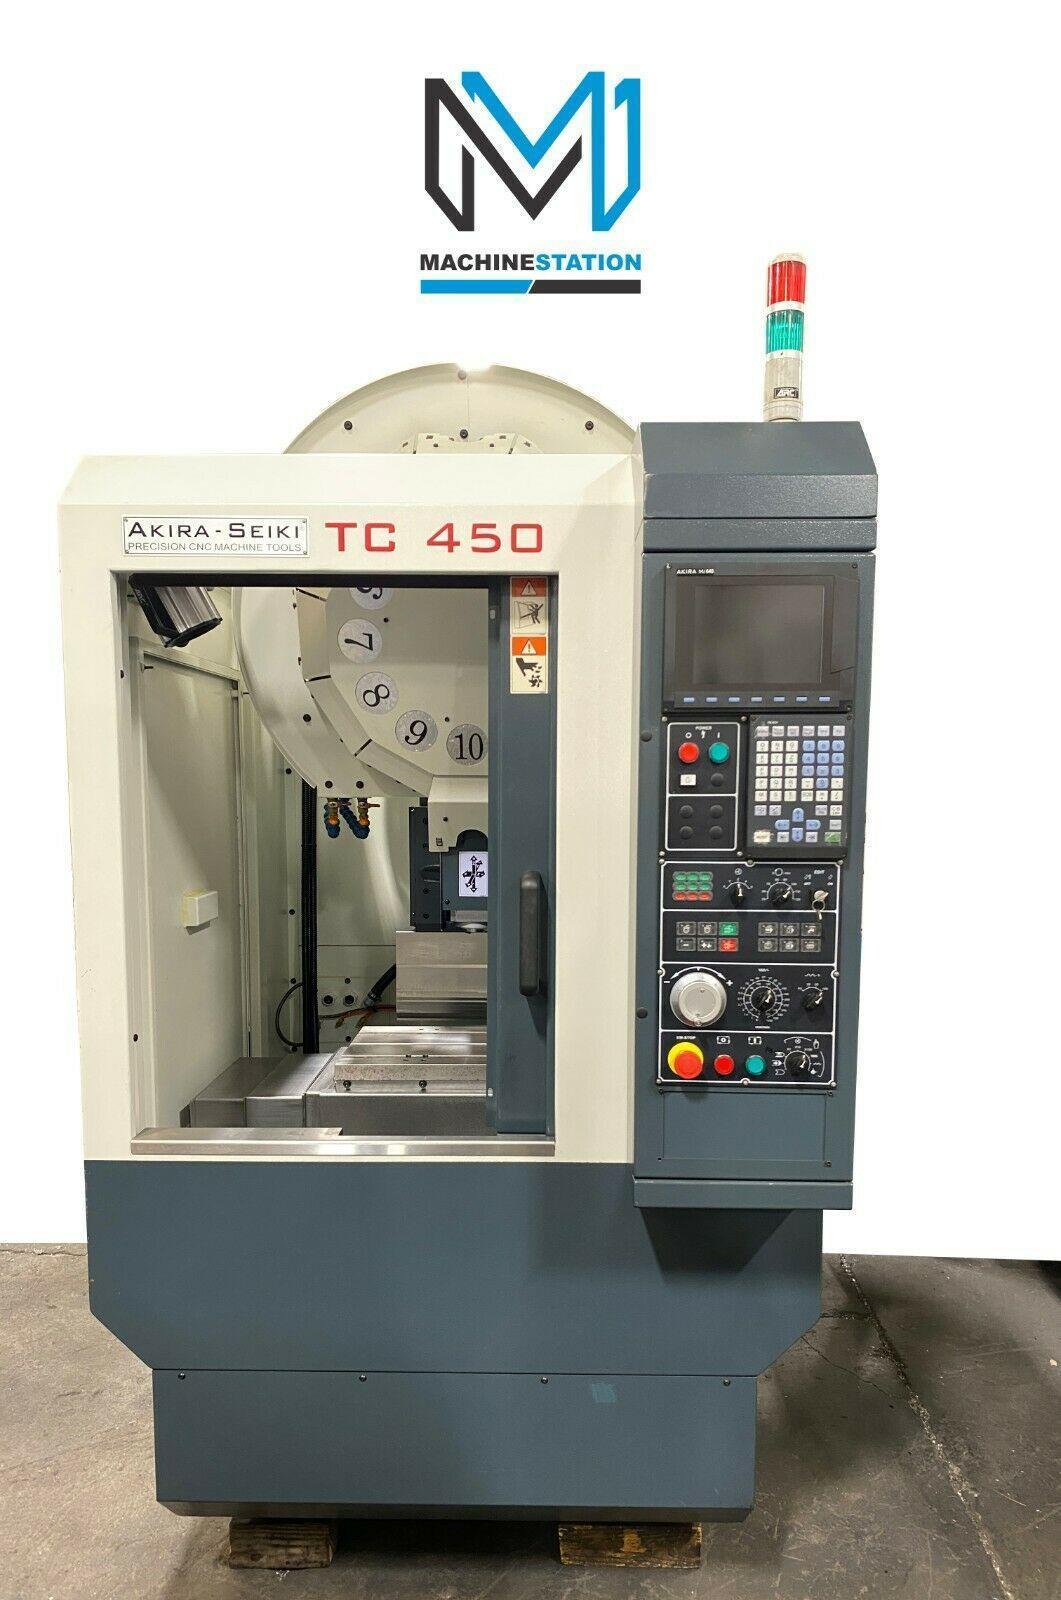 AKIRA SEIKI TC-450 CNC DRILL TAP VERTICAL MACHINING CENTER